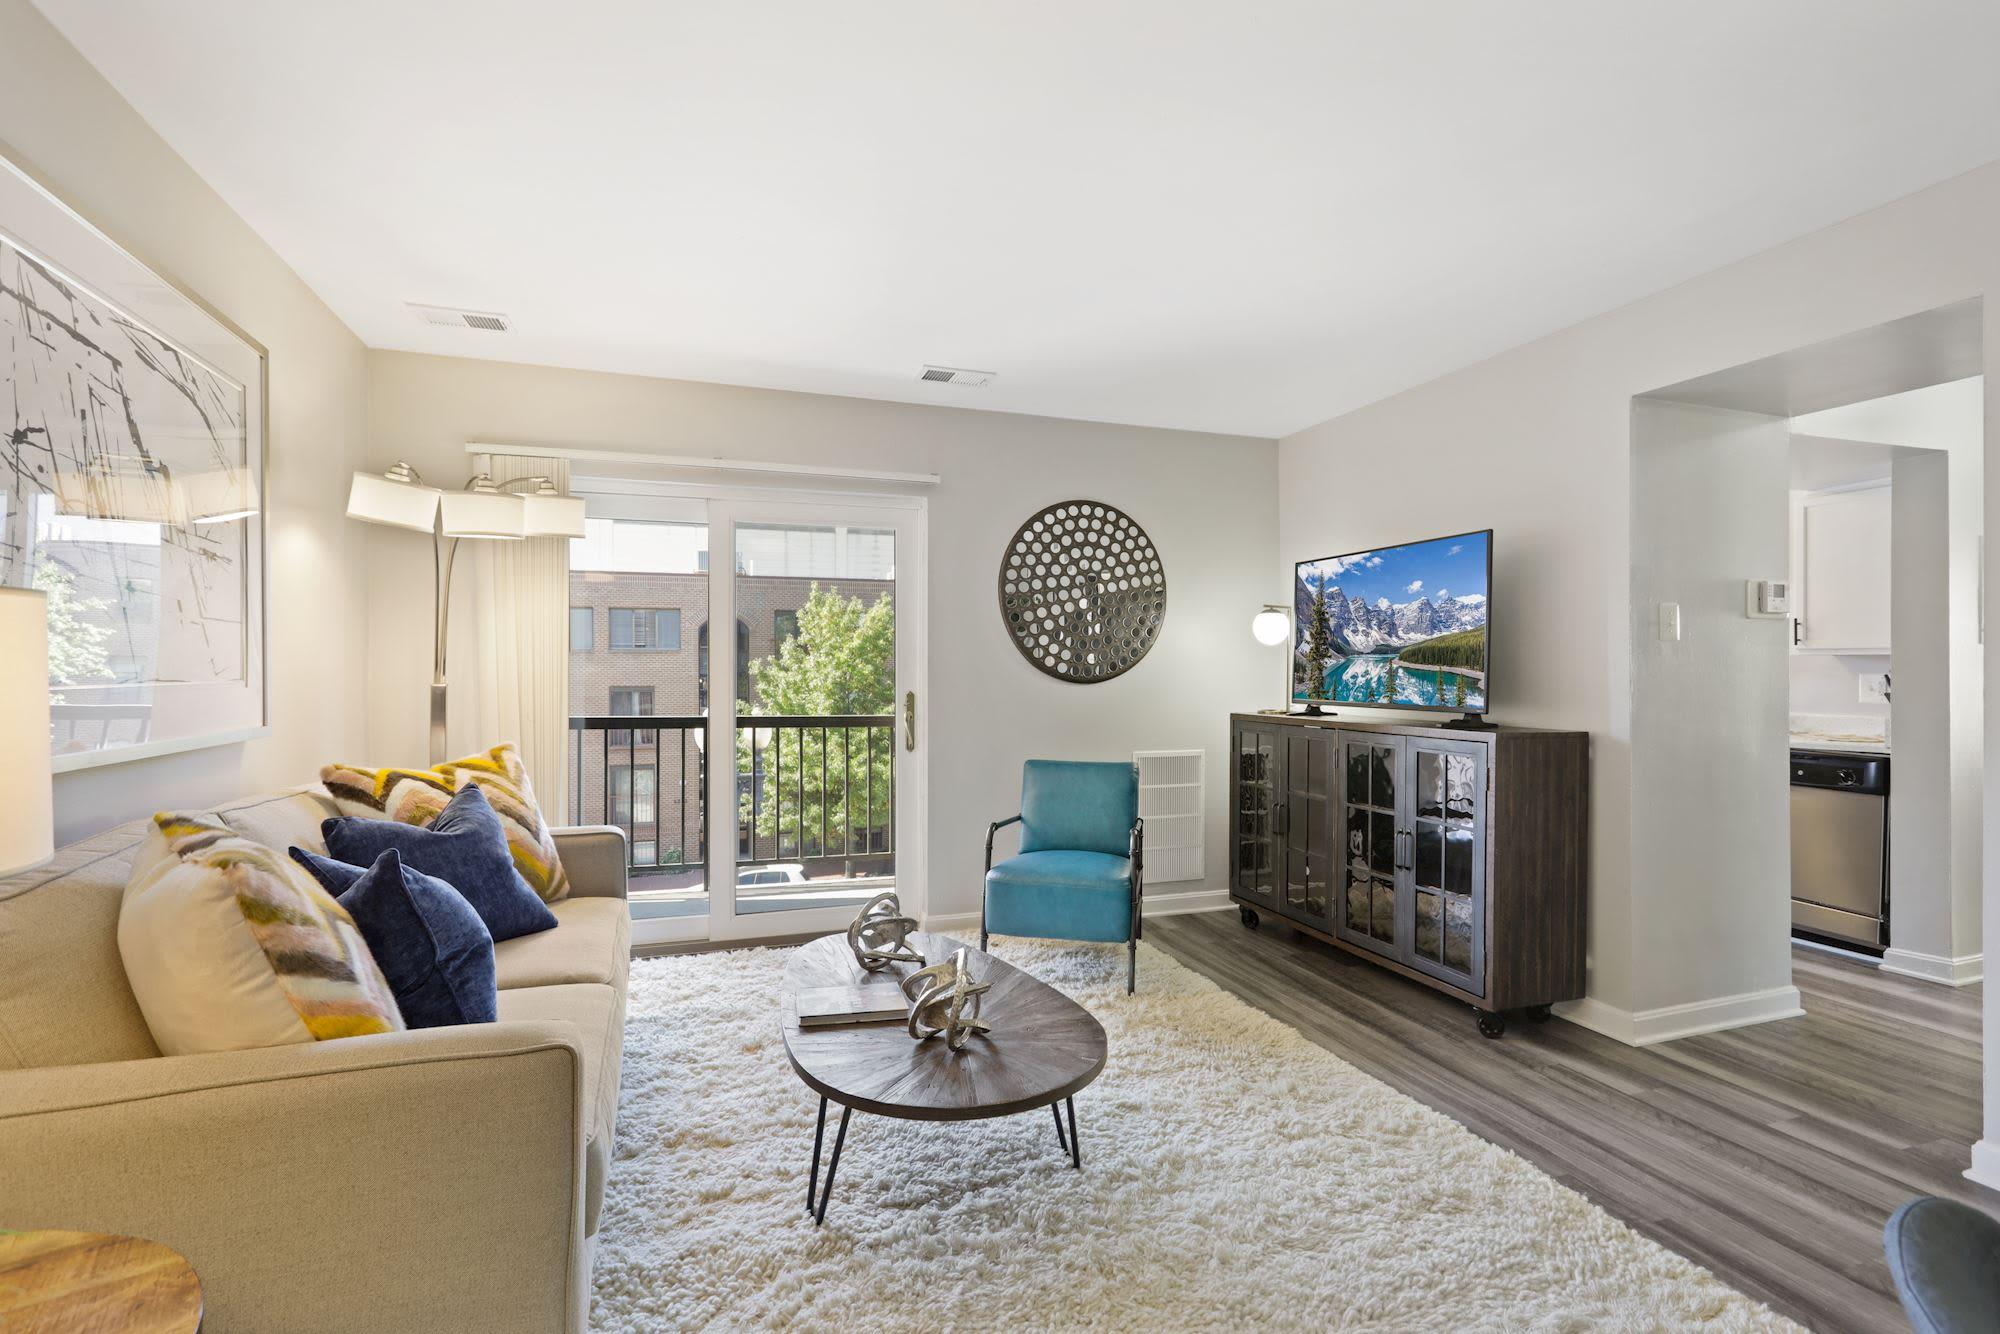 Shaw Washington Dc Apartments For Rent Washington Apartments